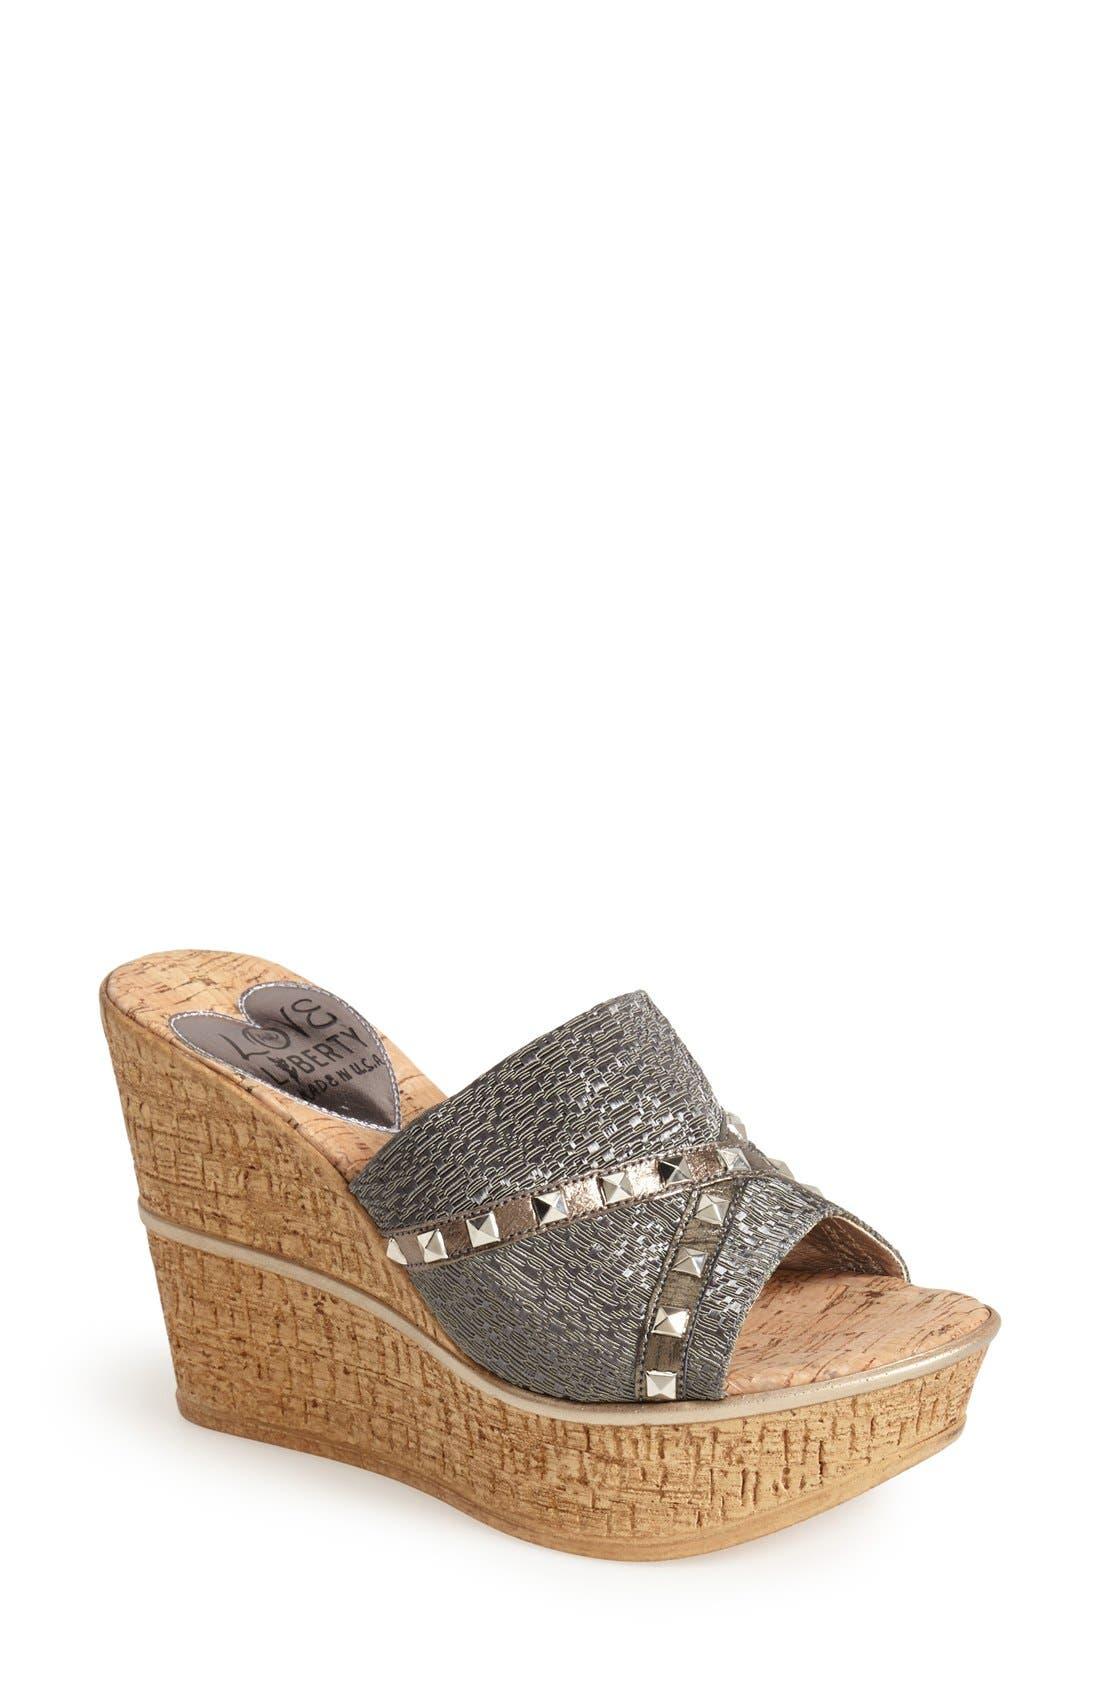 'Margo' Wedge Slide Sandal,                         Main,                         color, 040